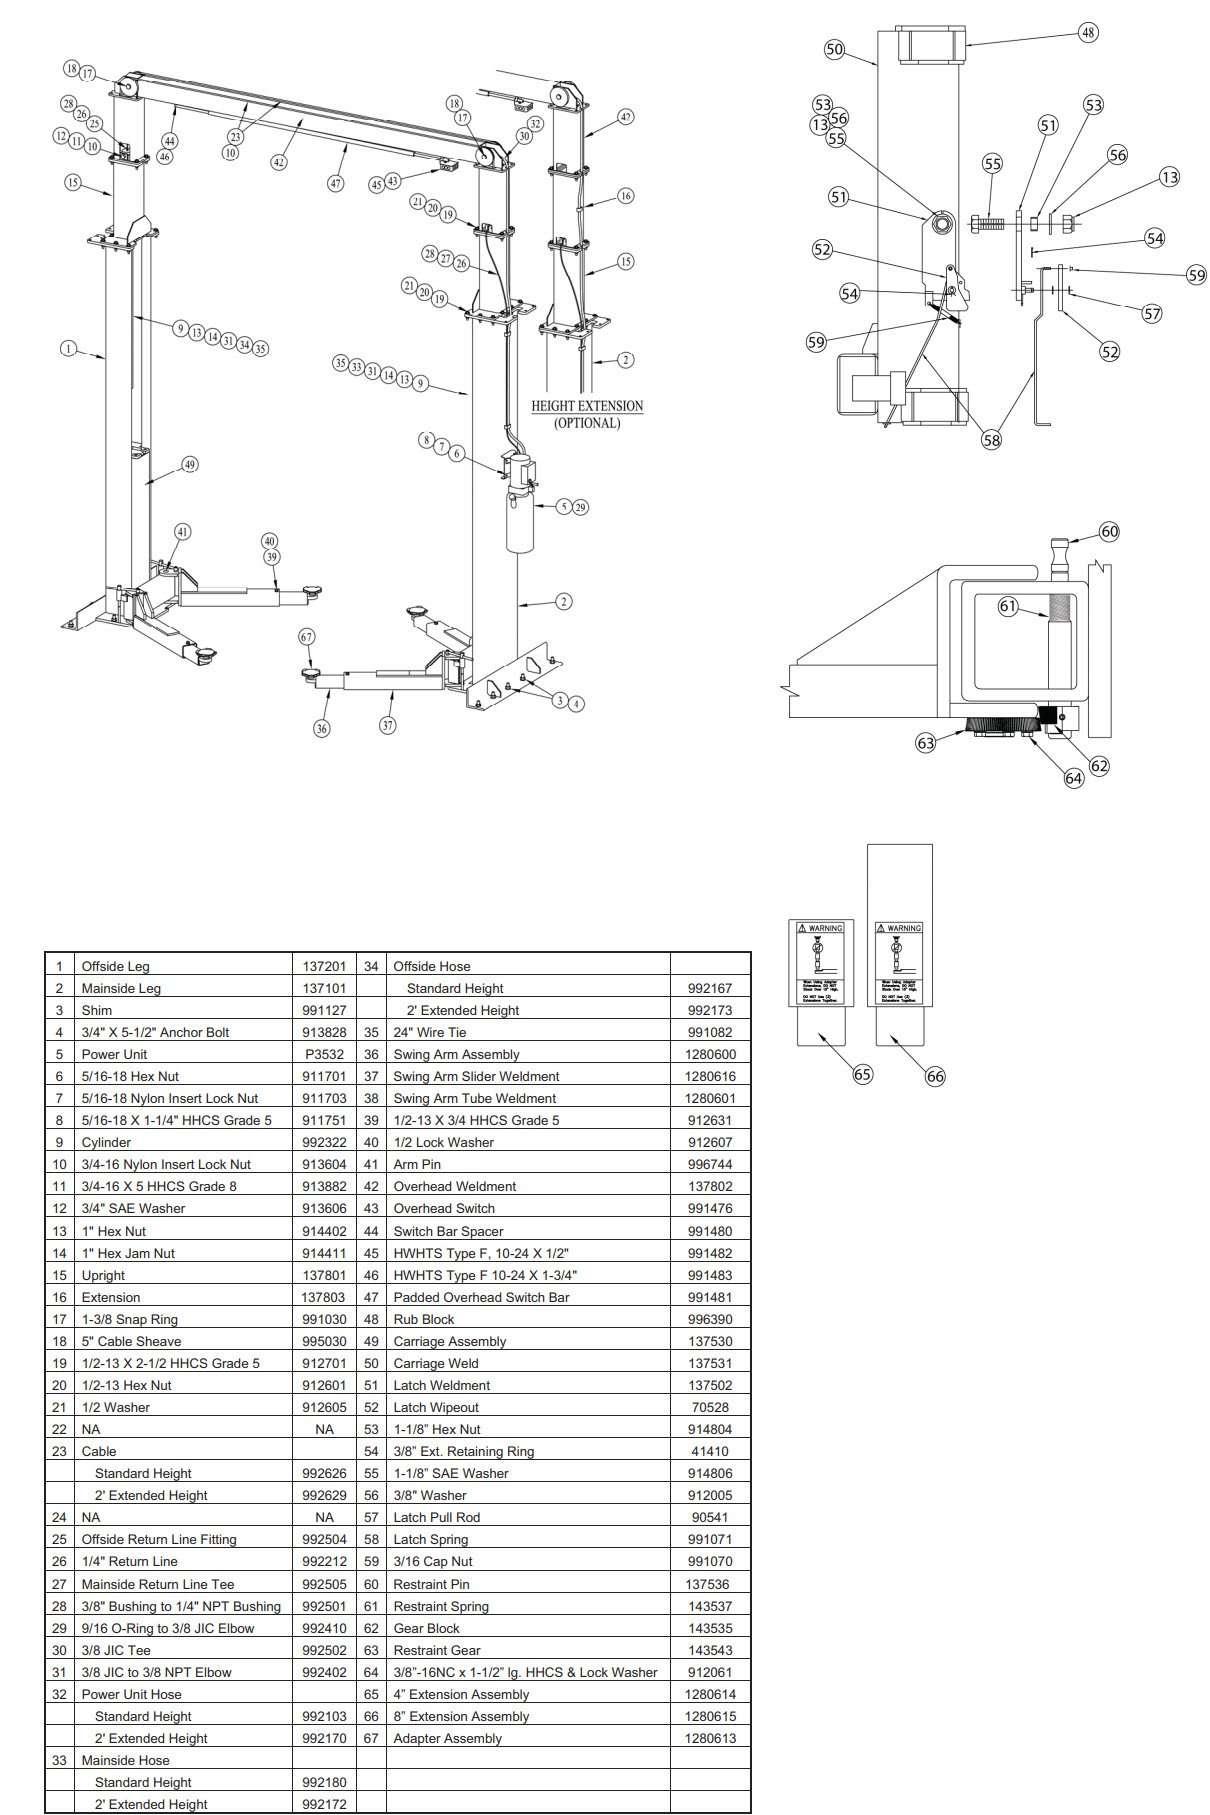 Forward DP12 Parts Manual